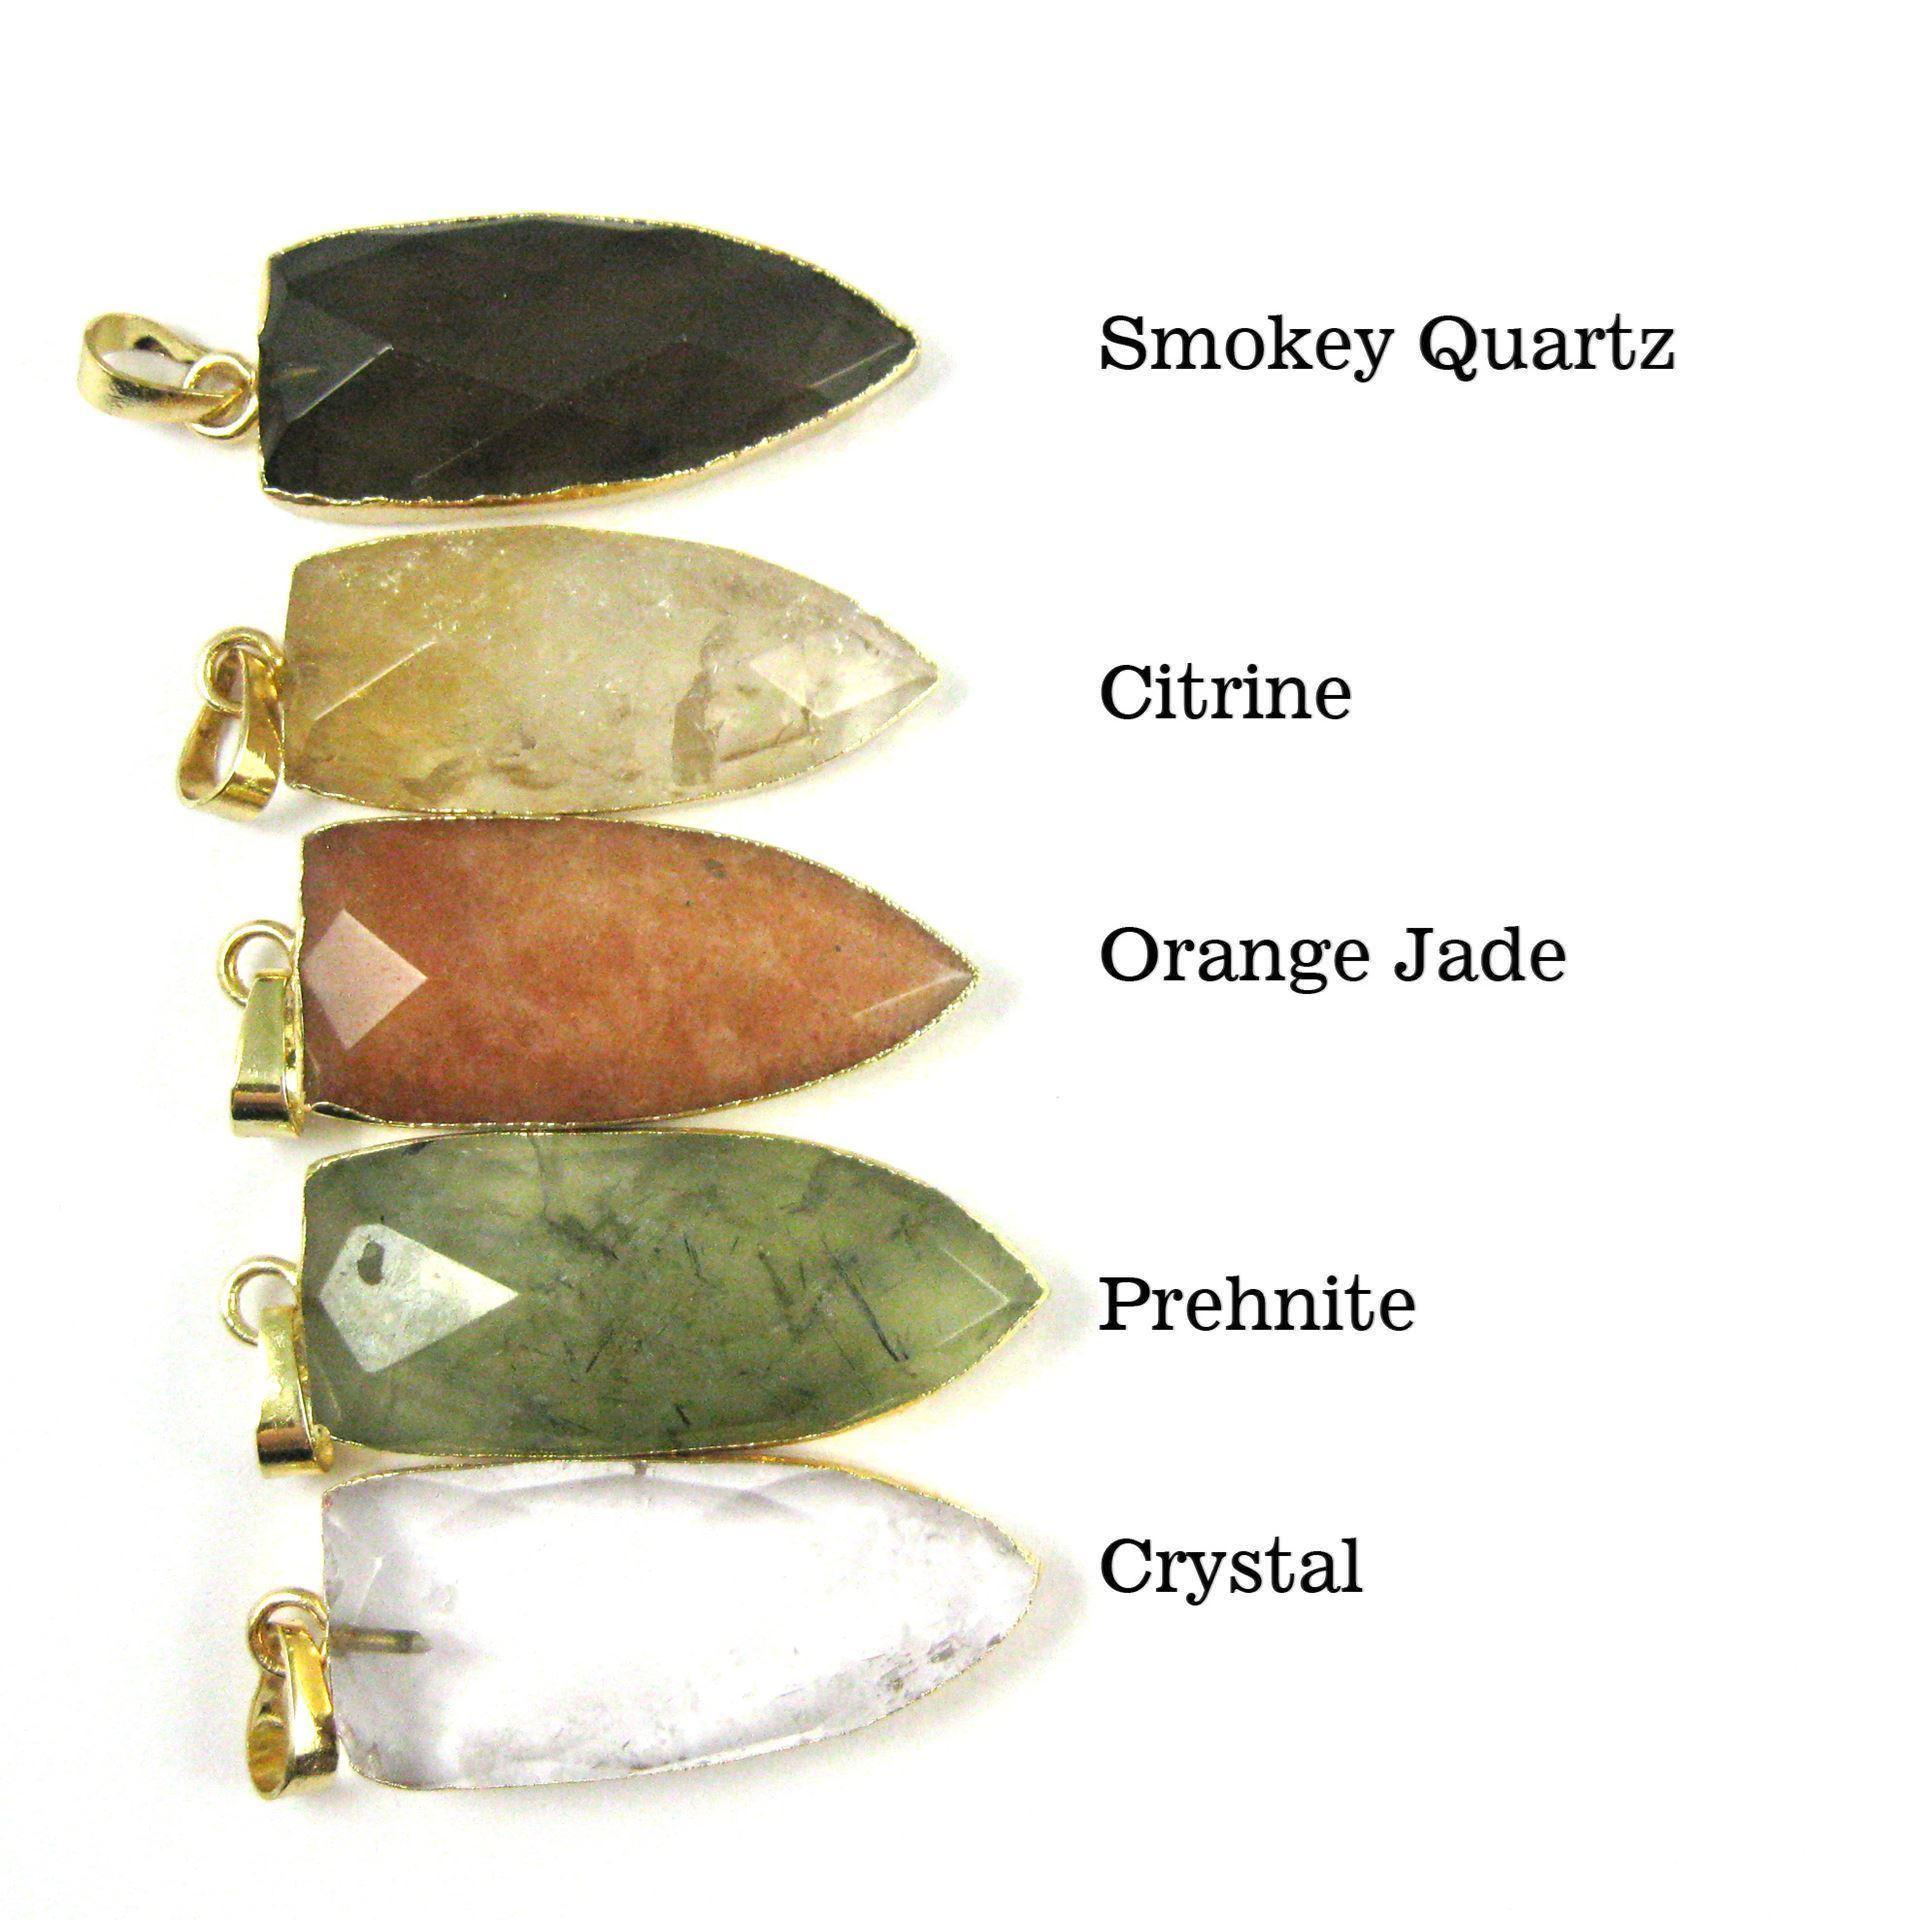 Gold Plated Faceted Arrowhead Pendant-Arrowhead charm-Natural Gemstone Spike Pendant - Aventurine - 40mm